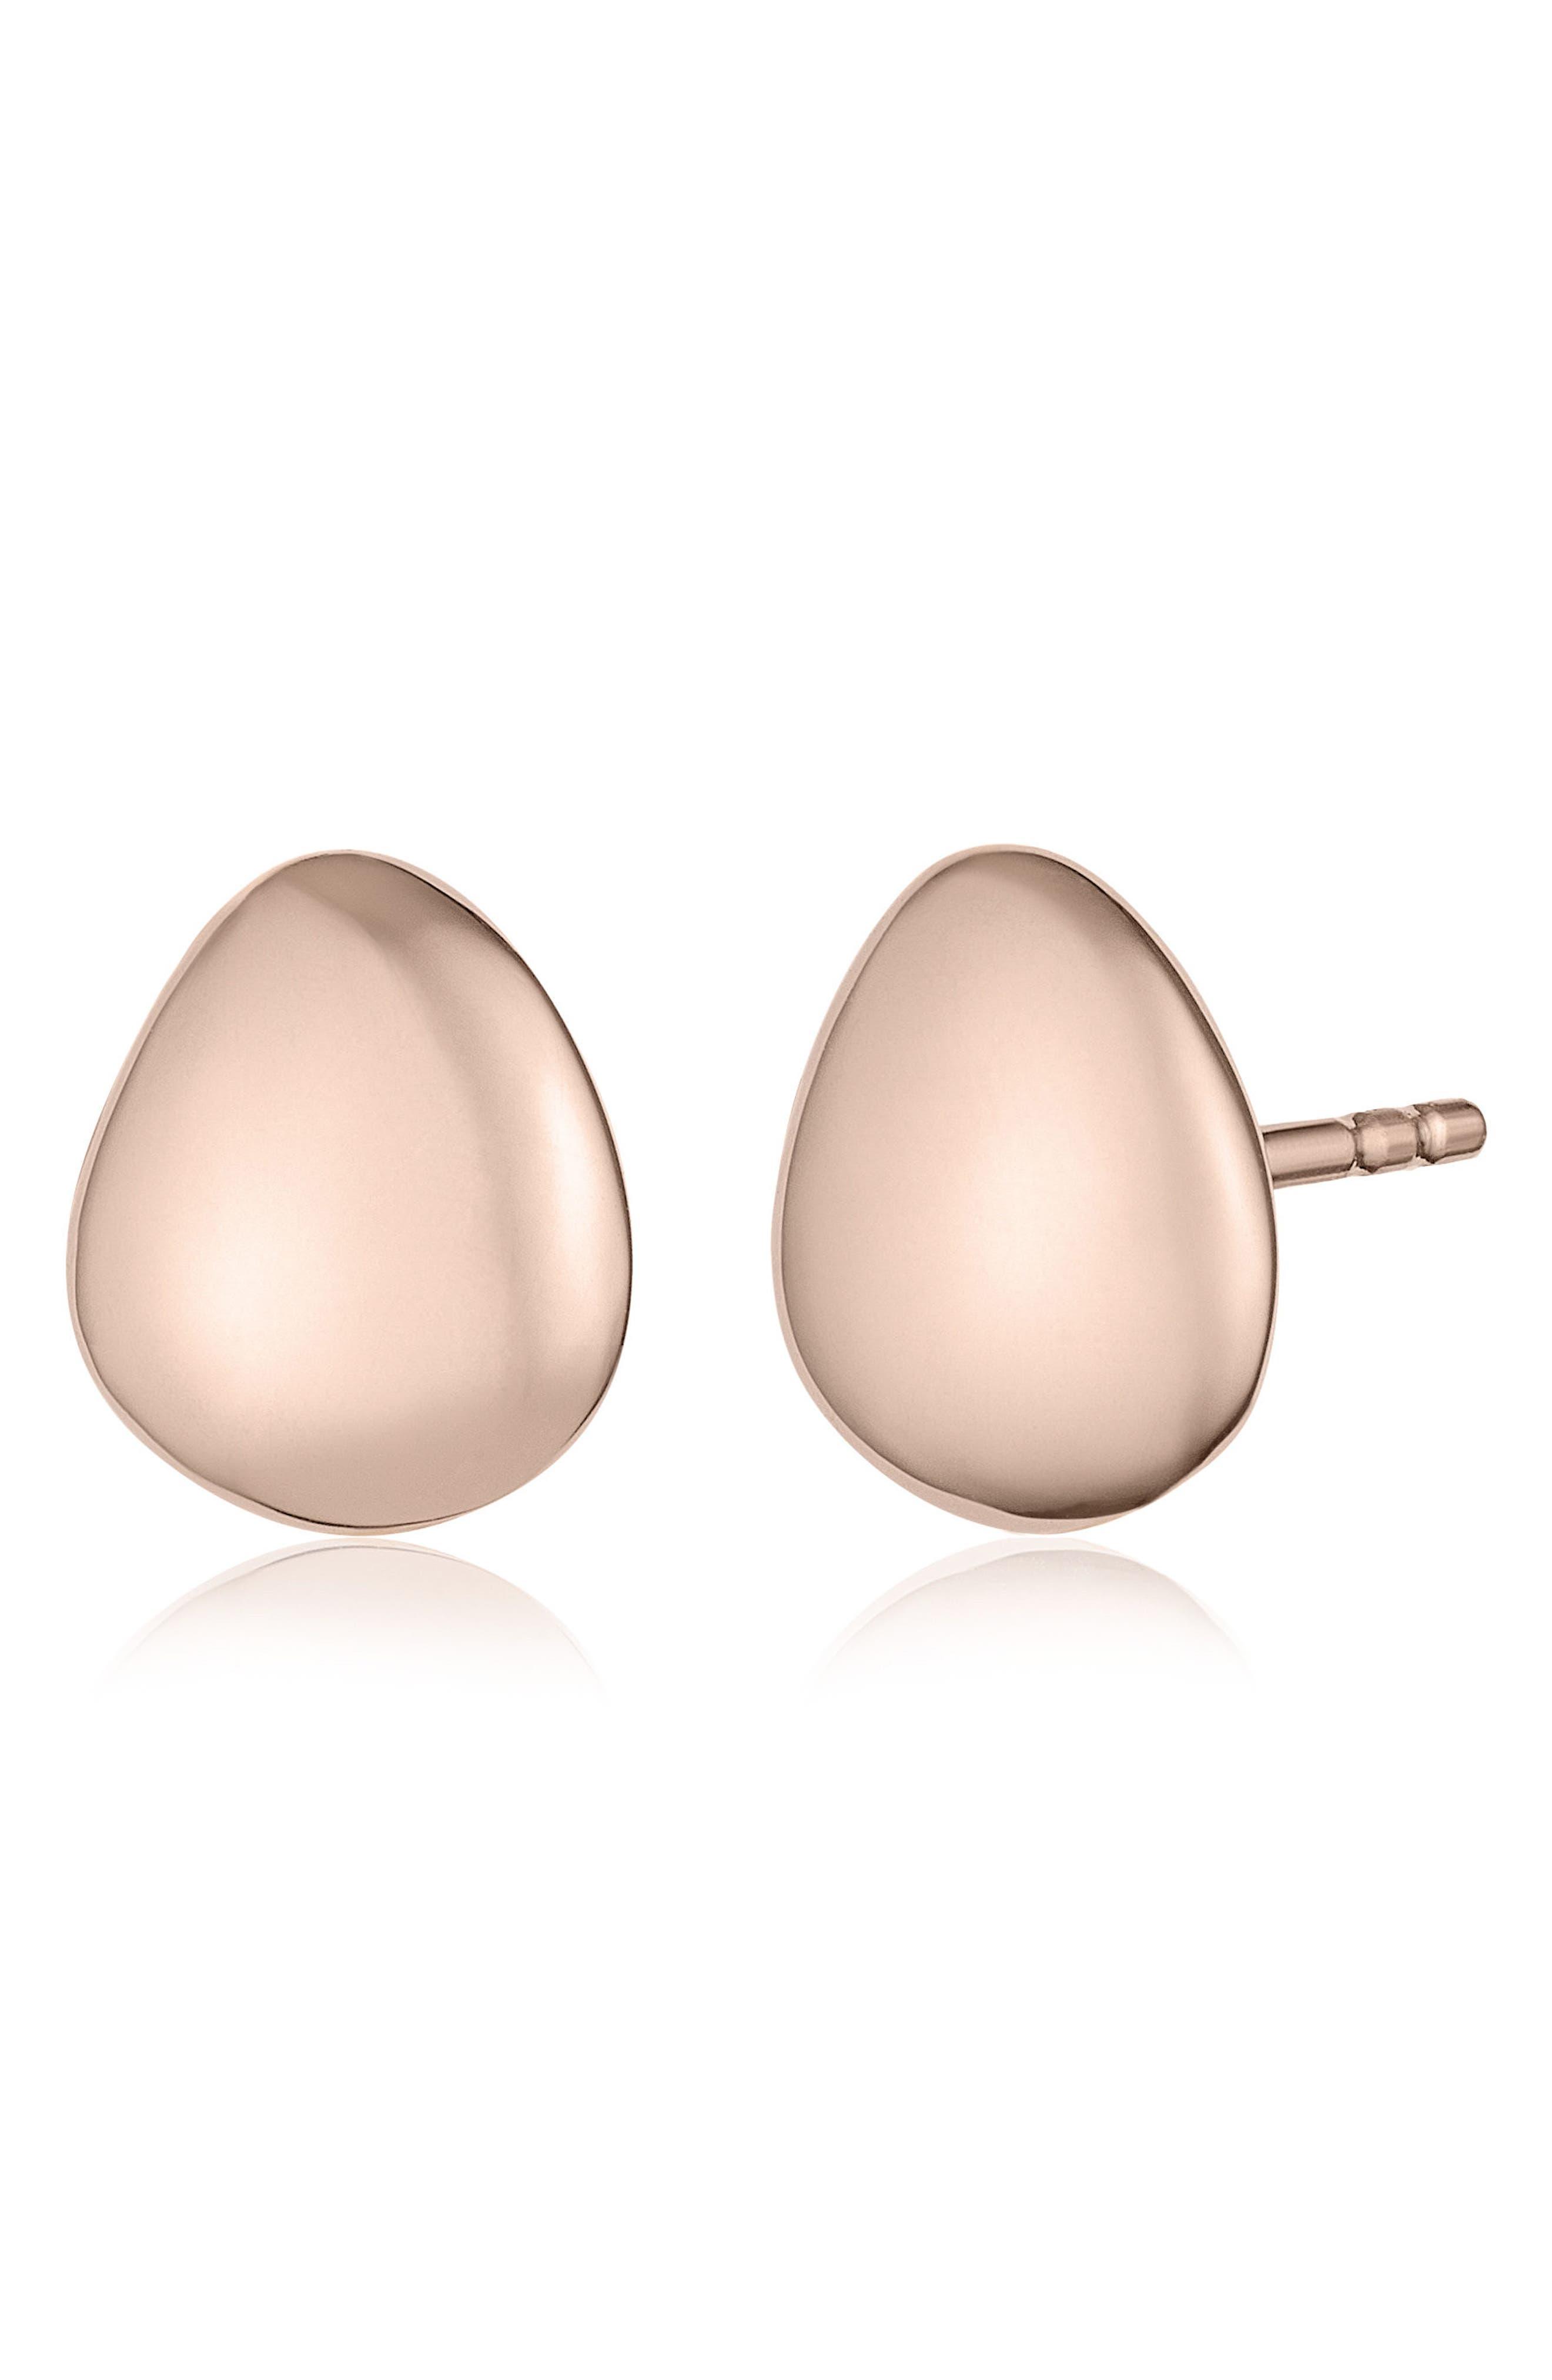 Nura Small Pebble Stud Earrings,                             Main thumbnail 1, color,                             ROSE GOLD